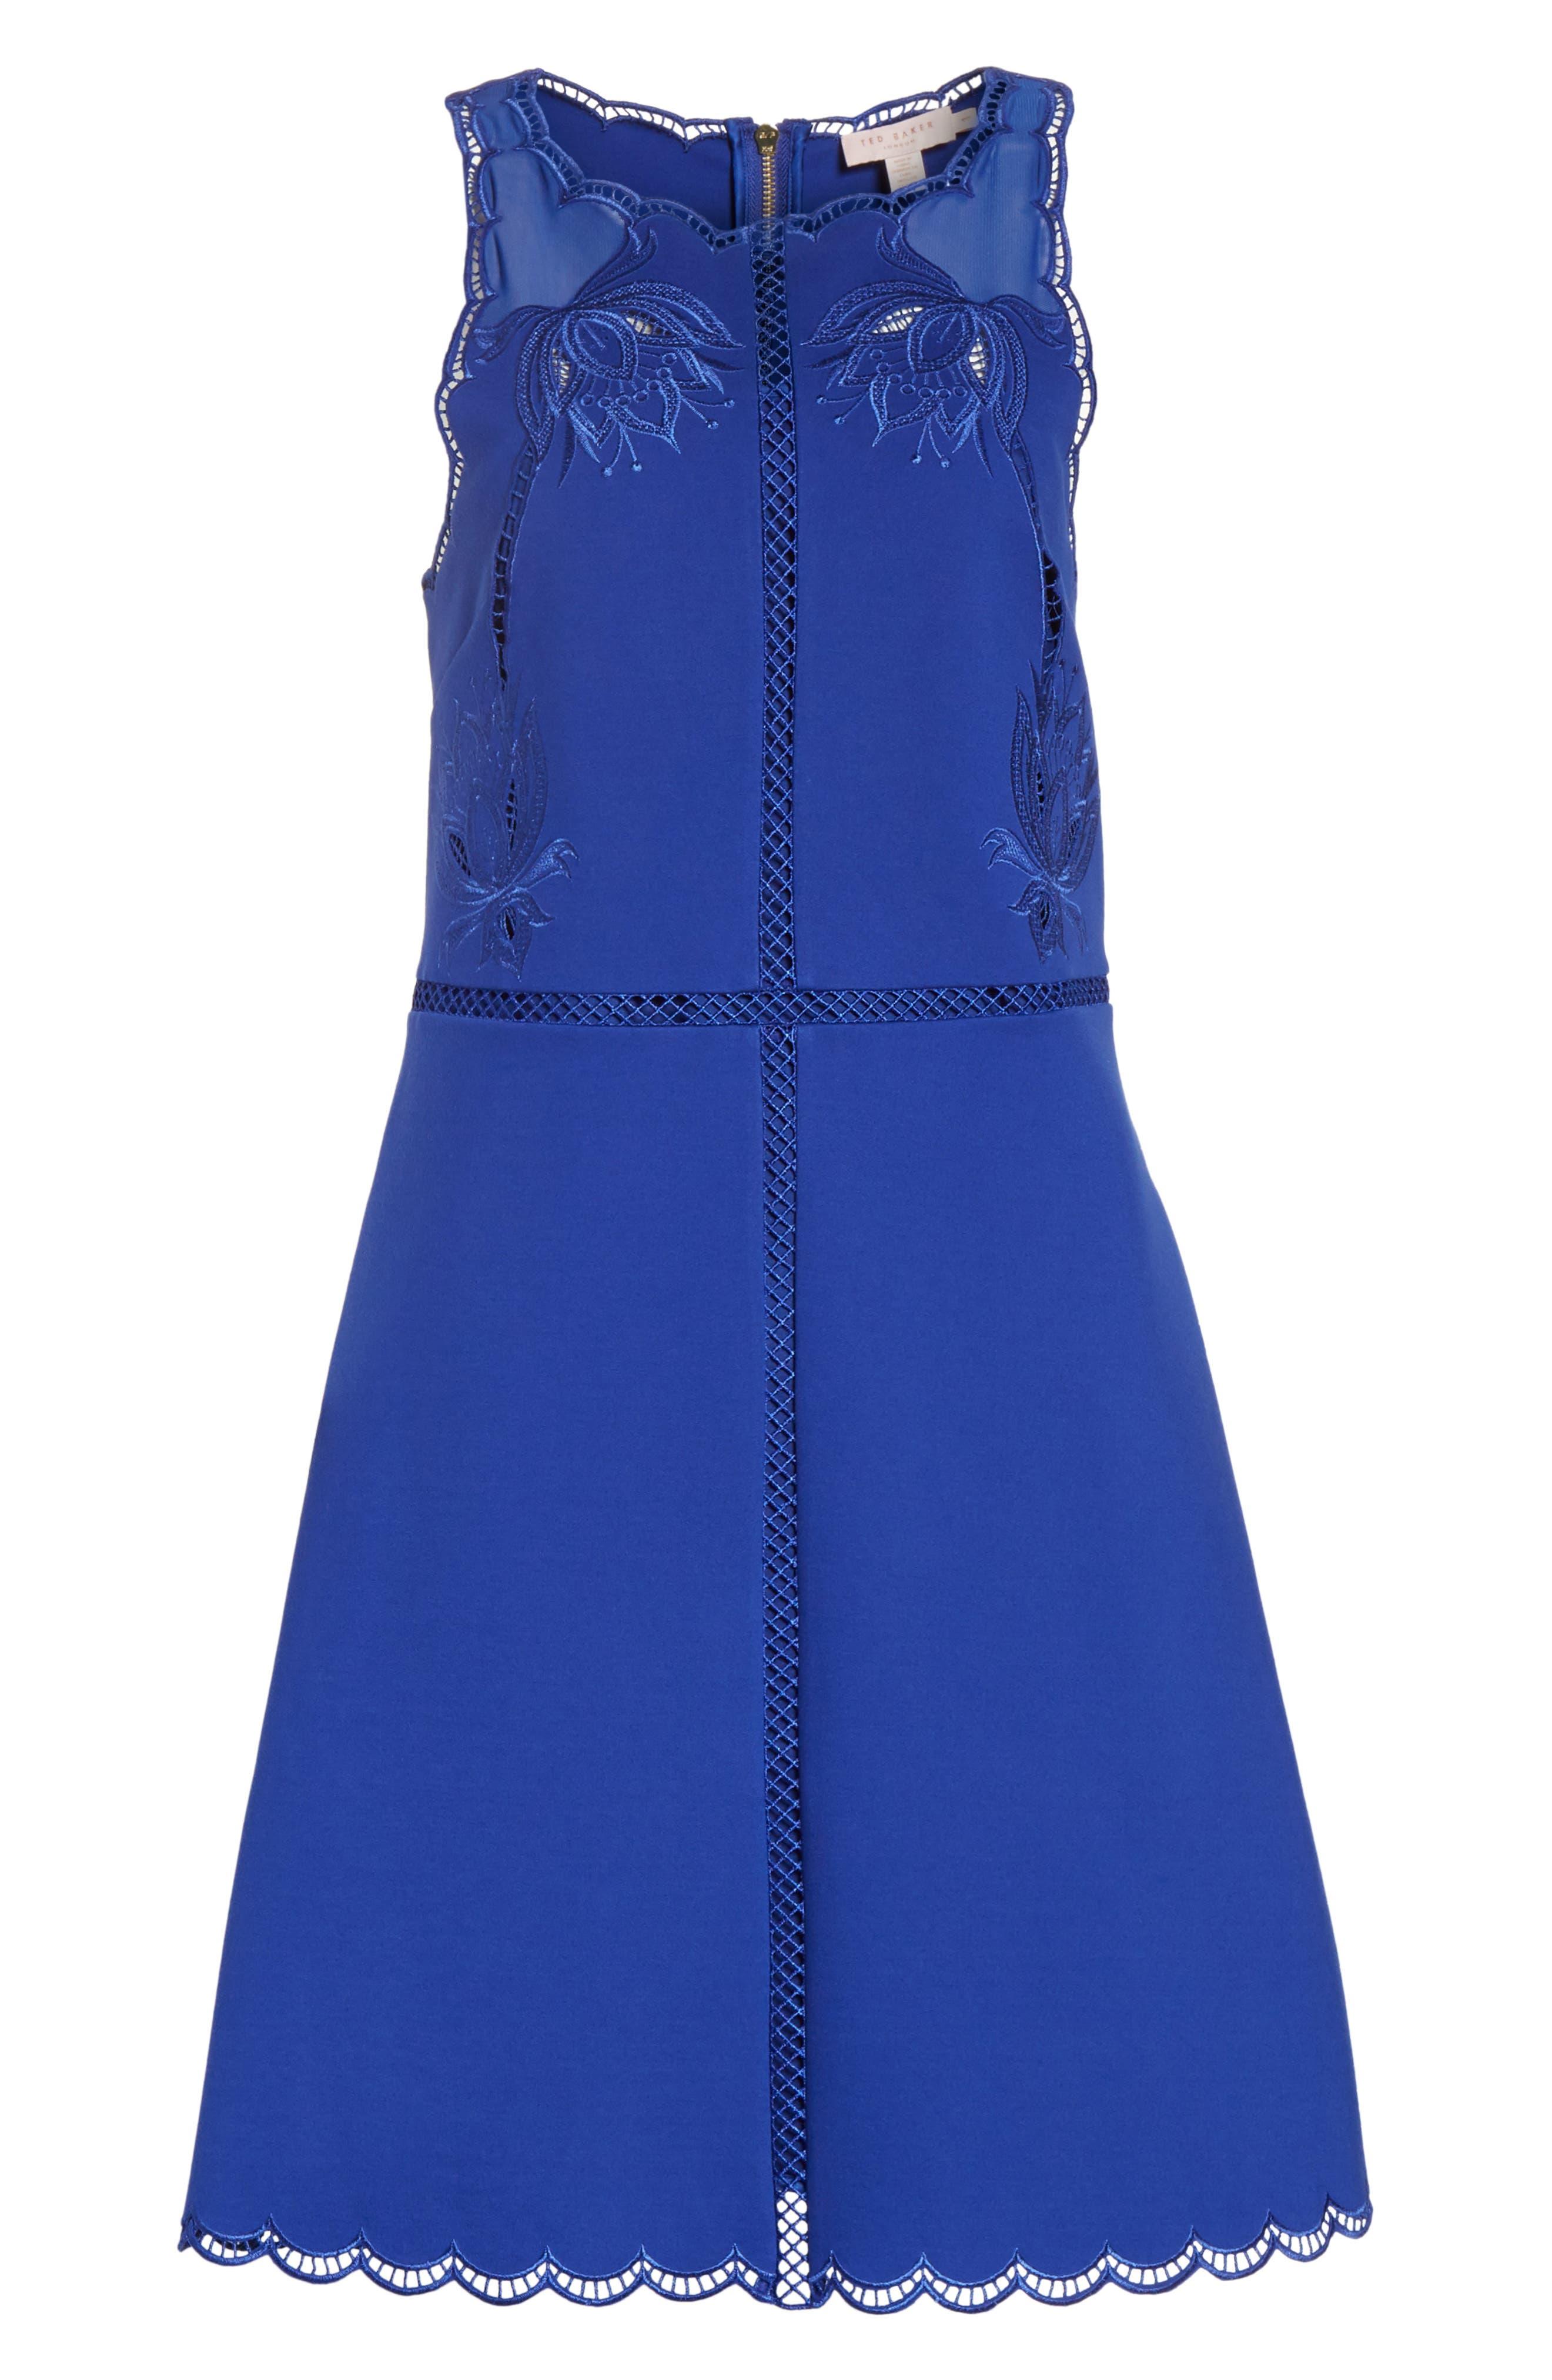 Codi Embroidered Scallop A-Line Dress,                             Alternate thumbnail 6, color,                             Mid Blue